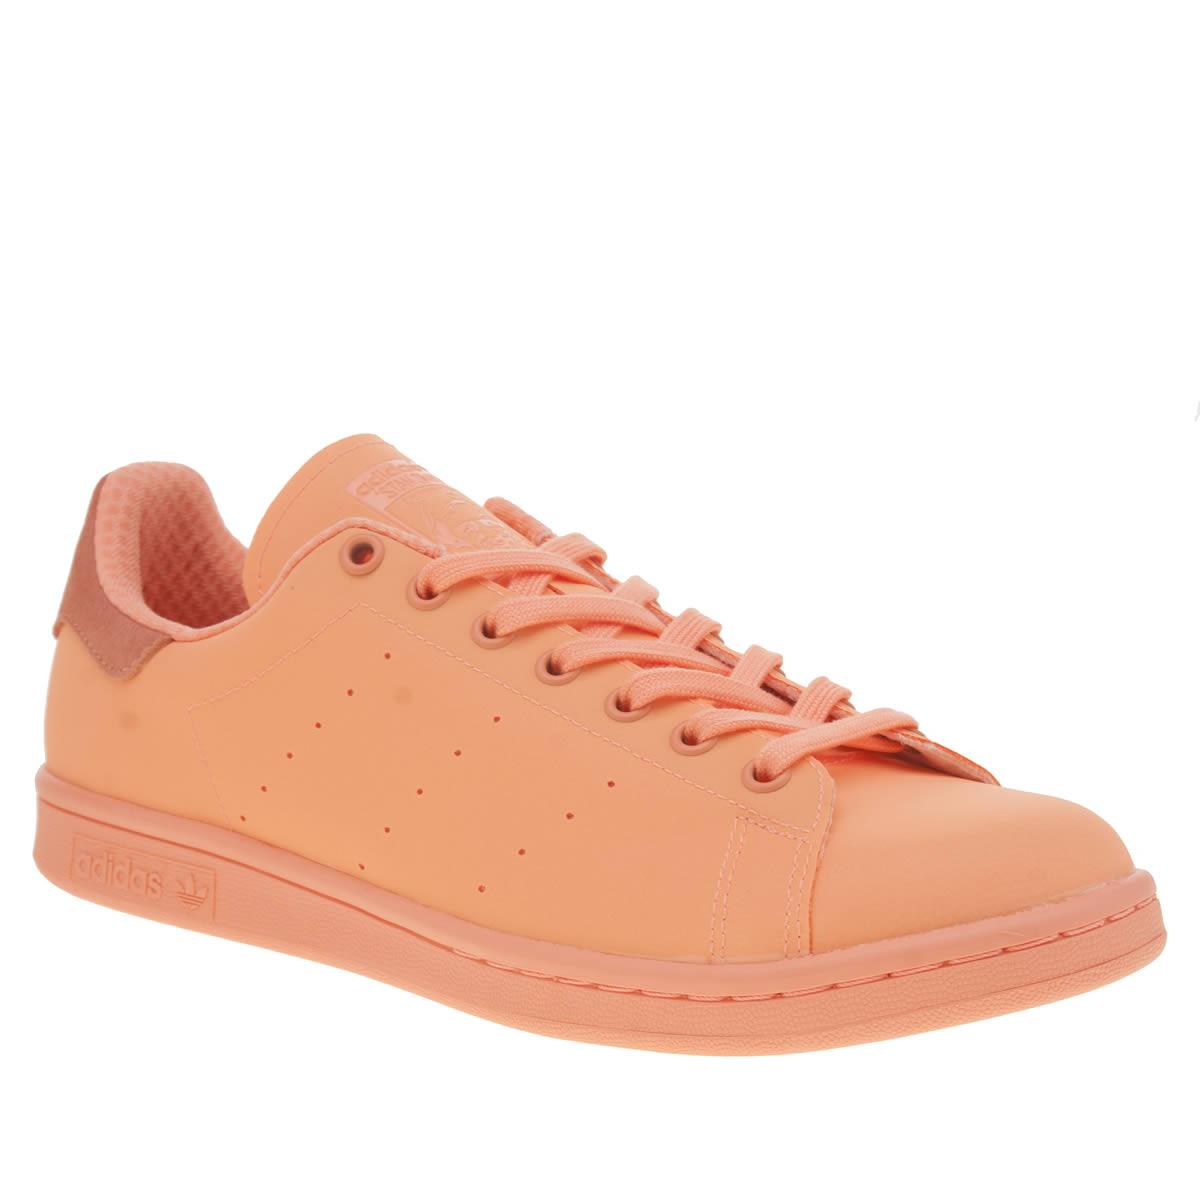 Adidas Stan Smith Peach